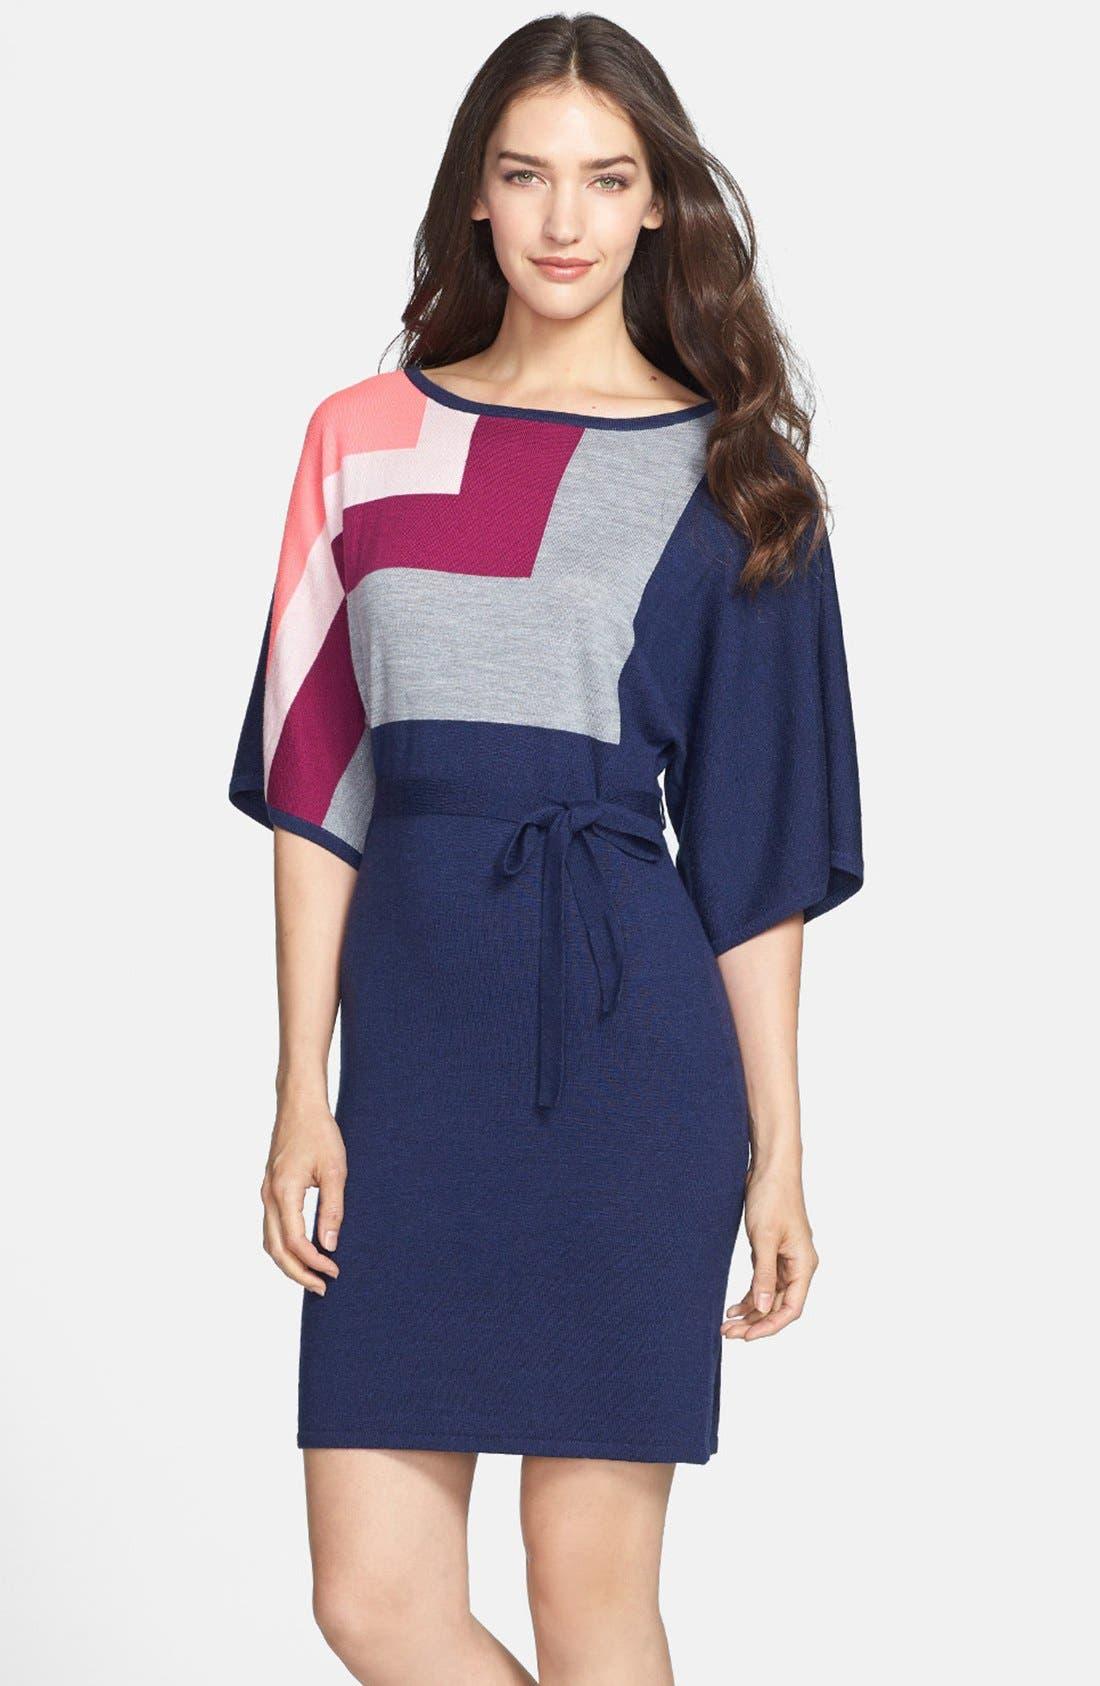 Alternate Image 1 Selected - Trina Turk 'Bonaire' Colorblock Merino Sweater Dress